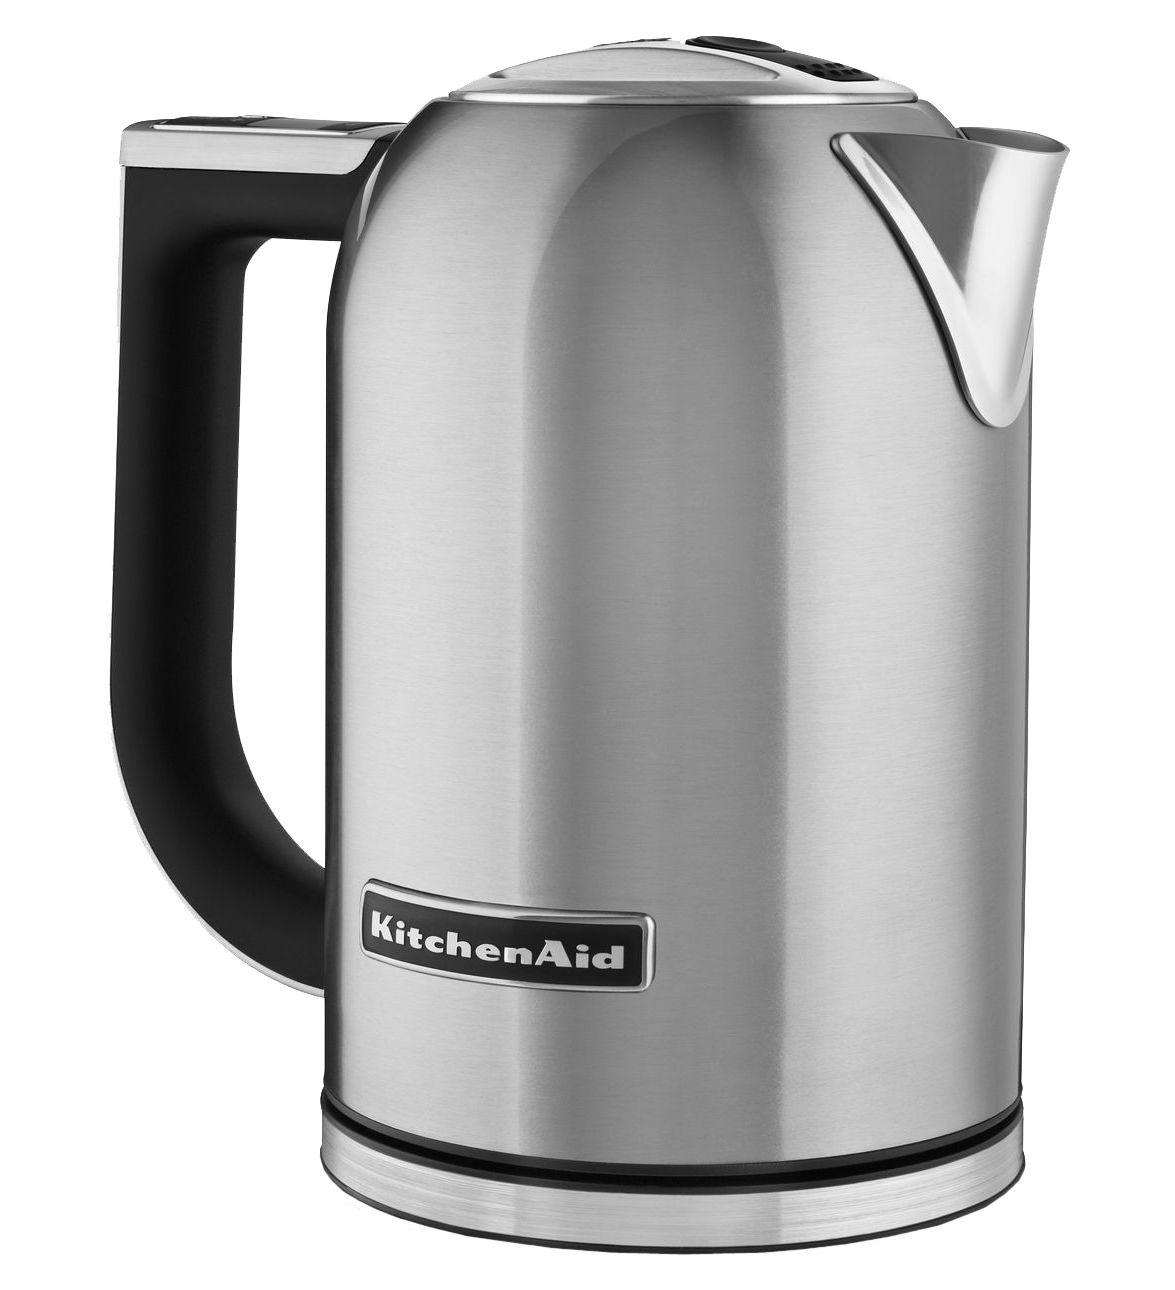 Kitchenaid Stainless Steel Electric Kettle Kek1722sx